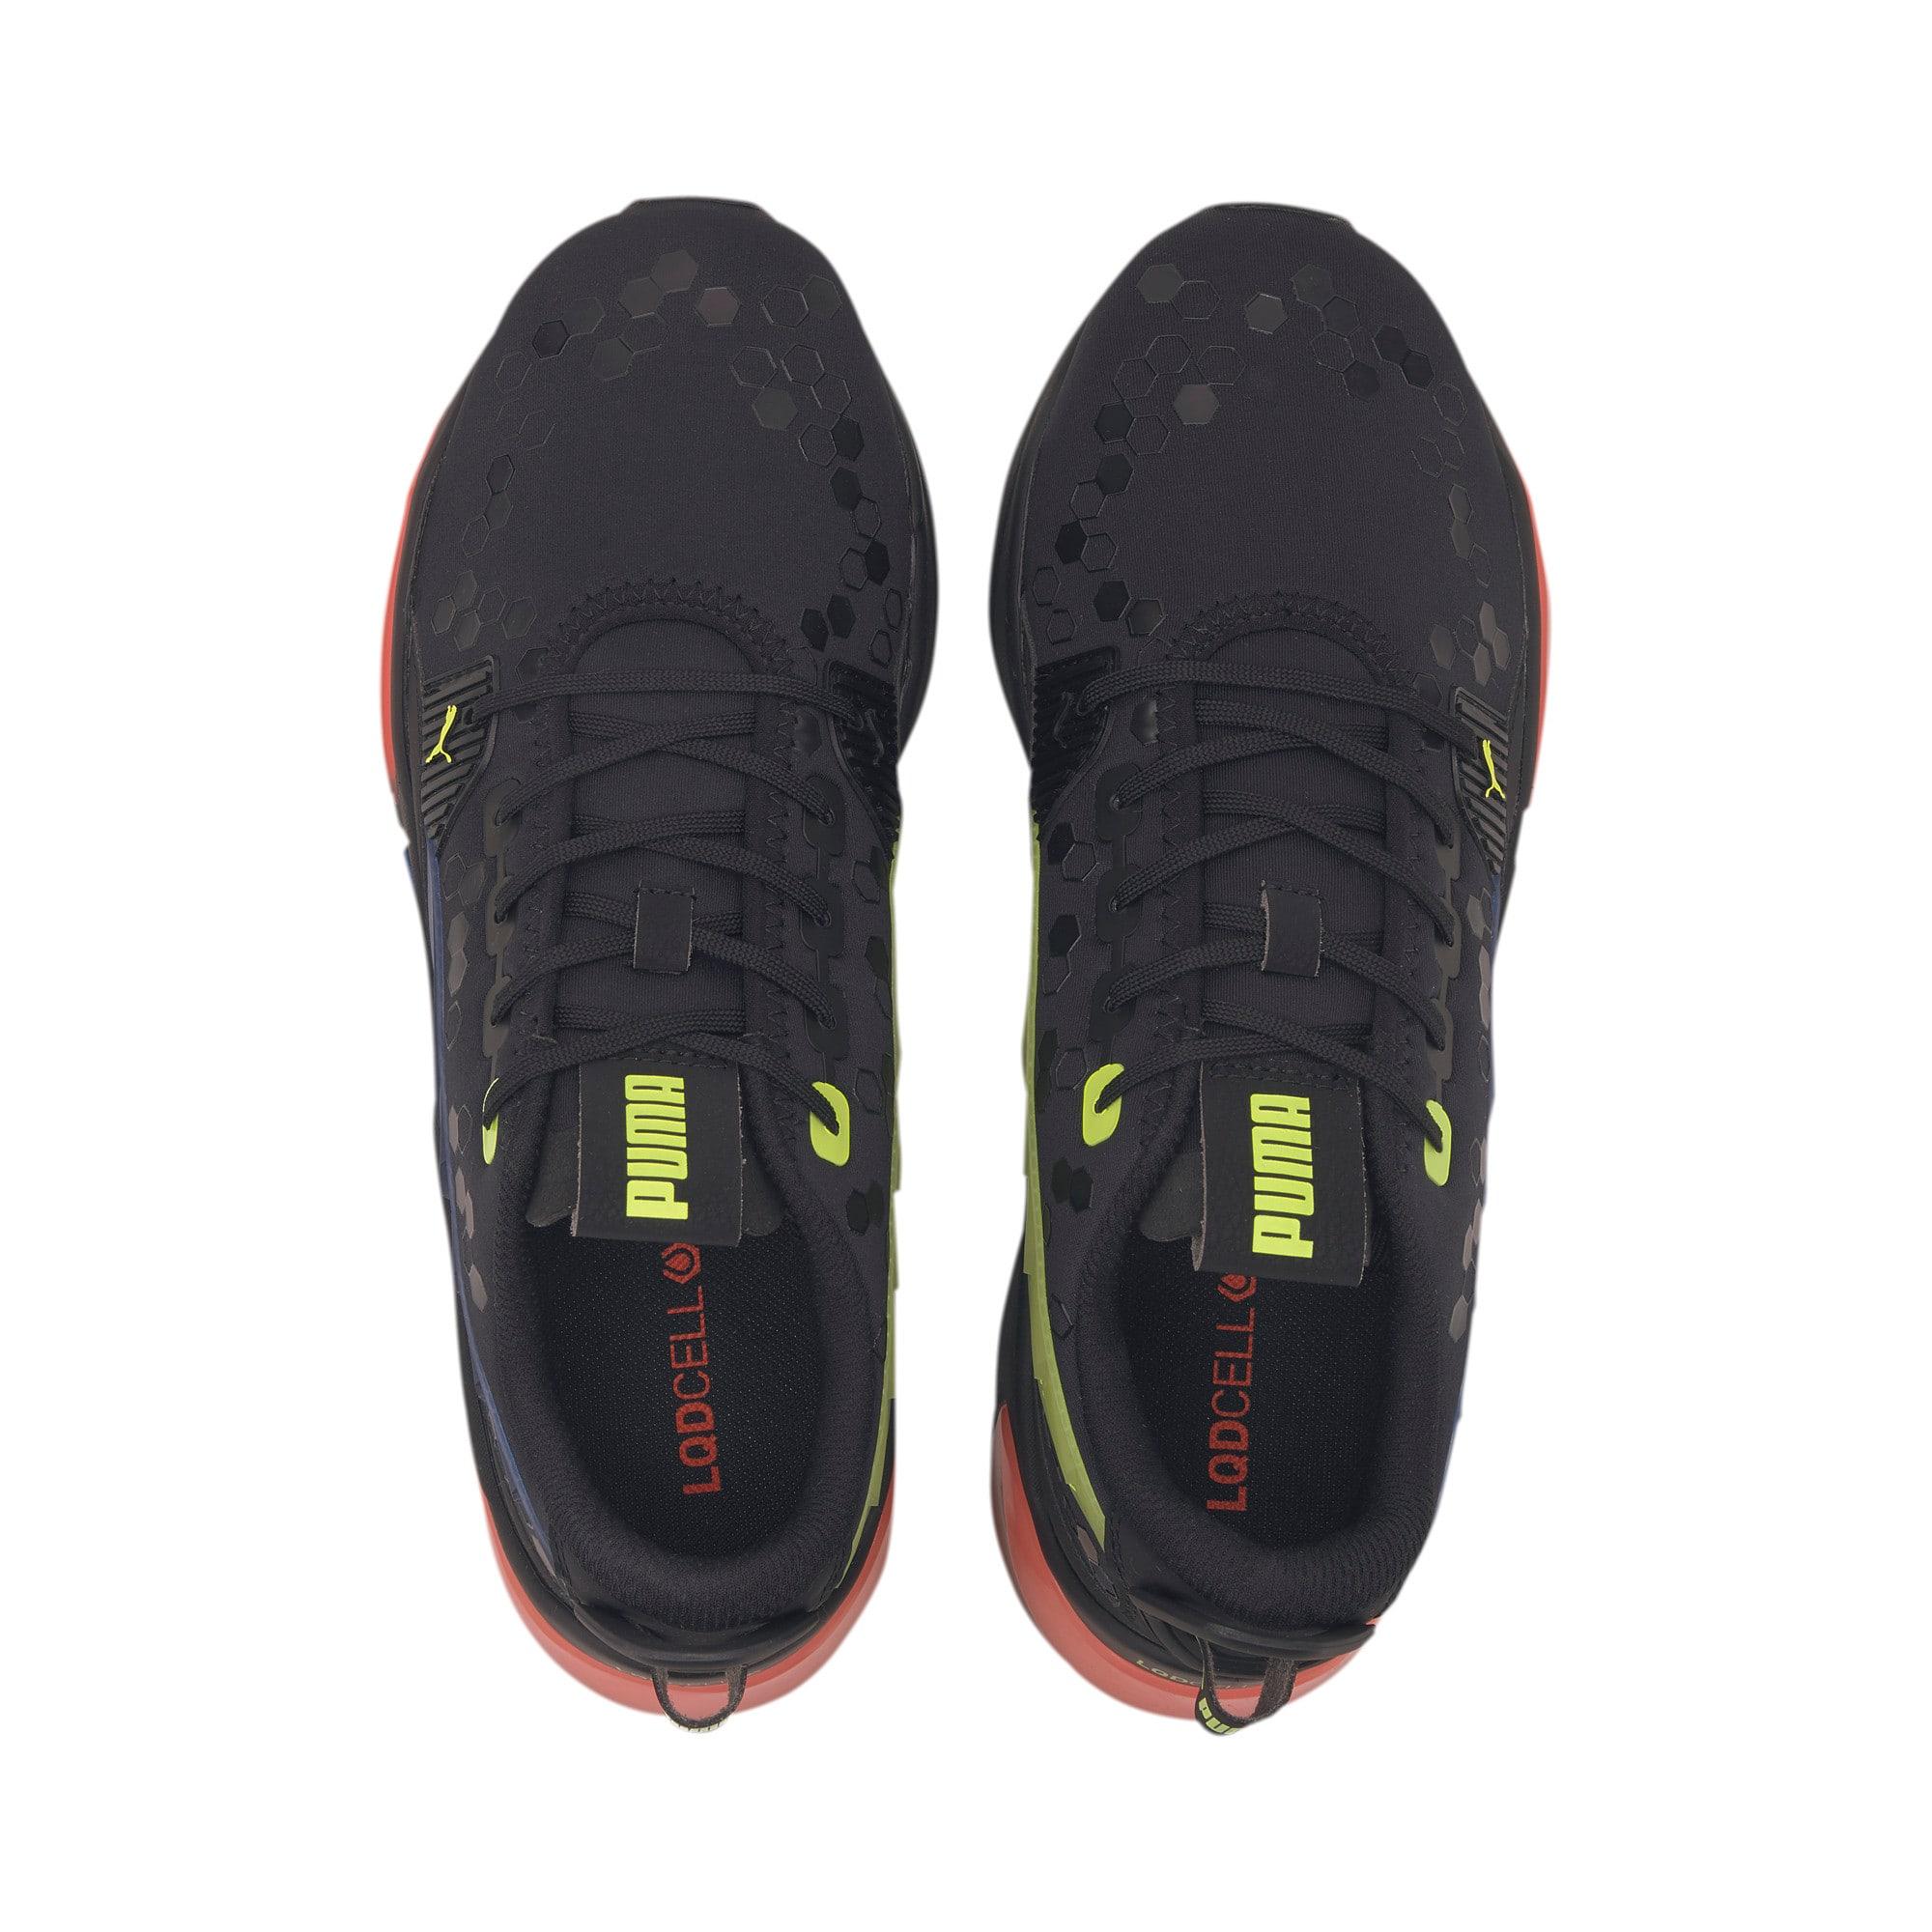 Thumbnail 6 of LQDCELL Optic Training Shoes, Puma Black, medium